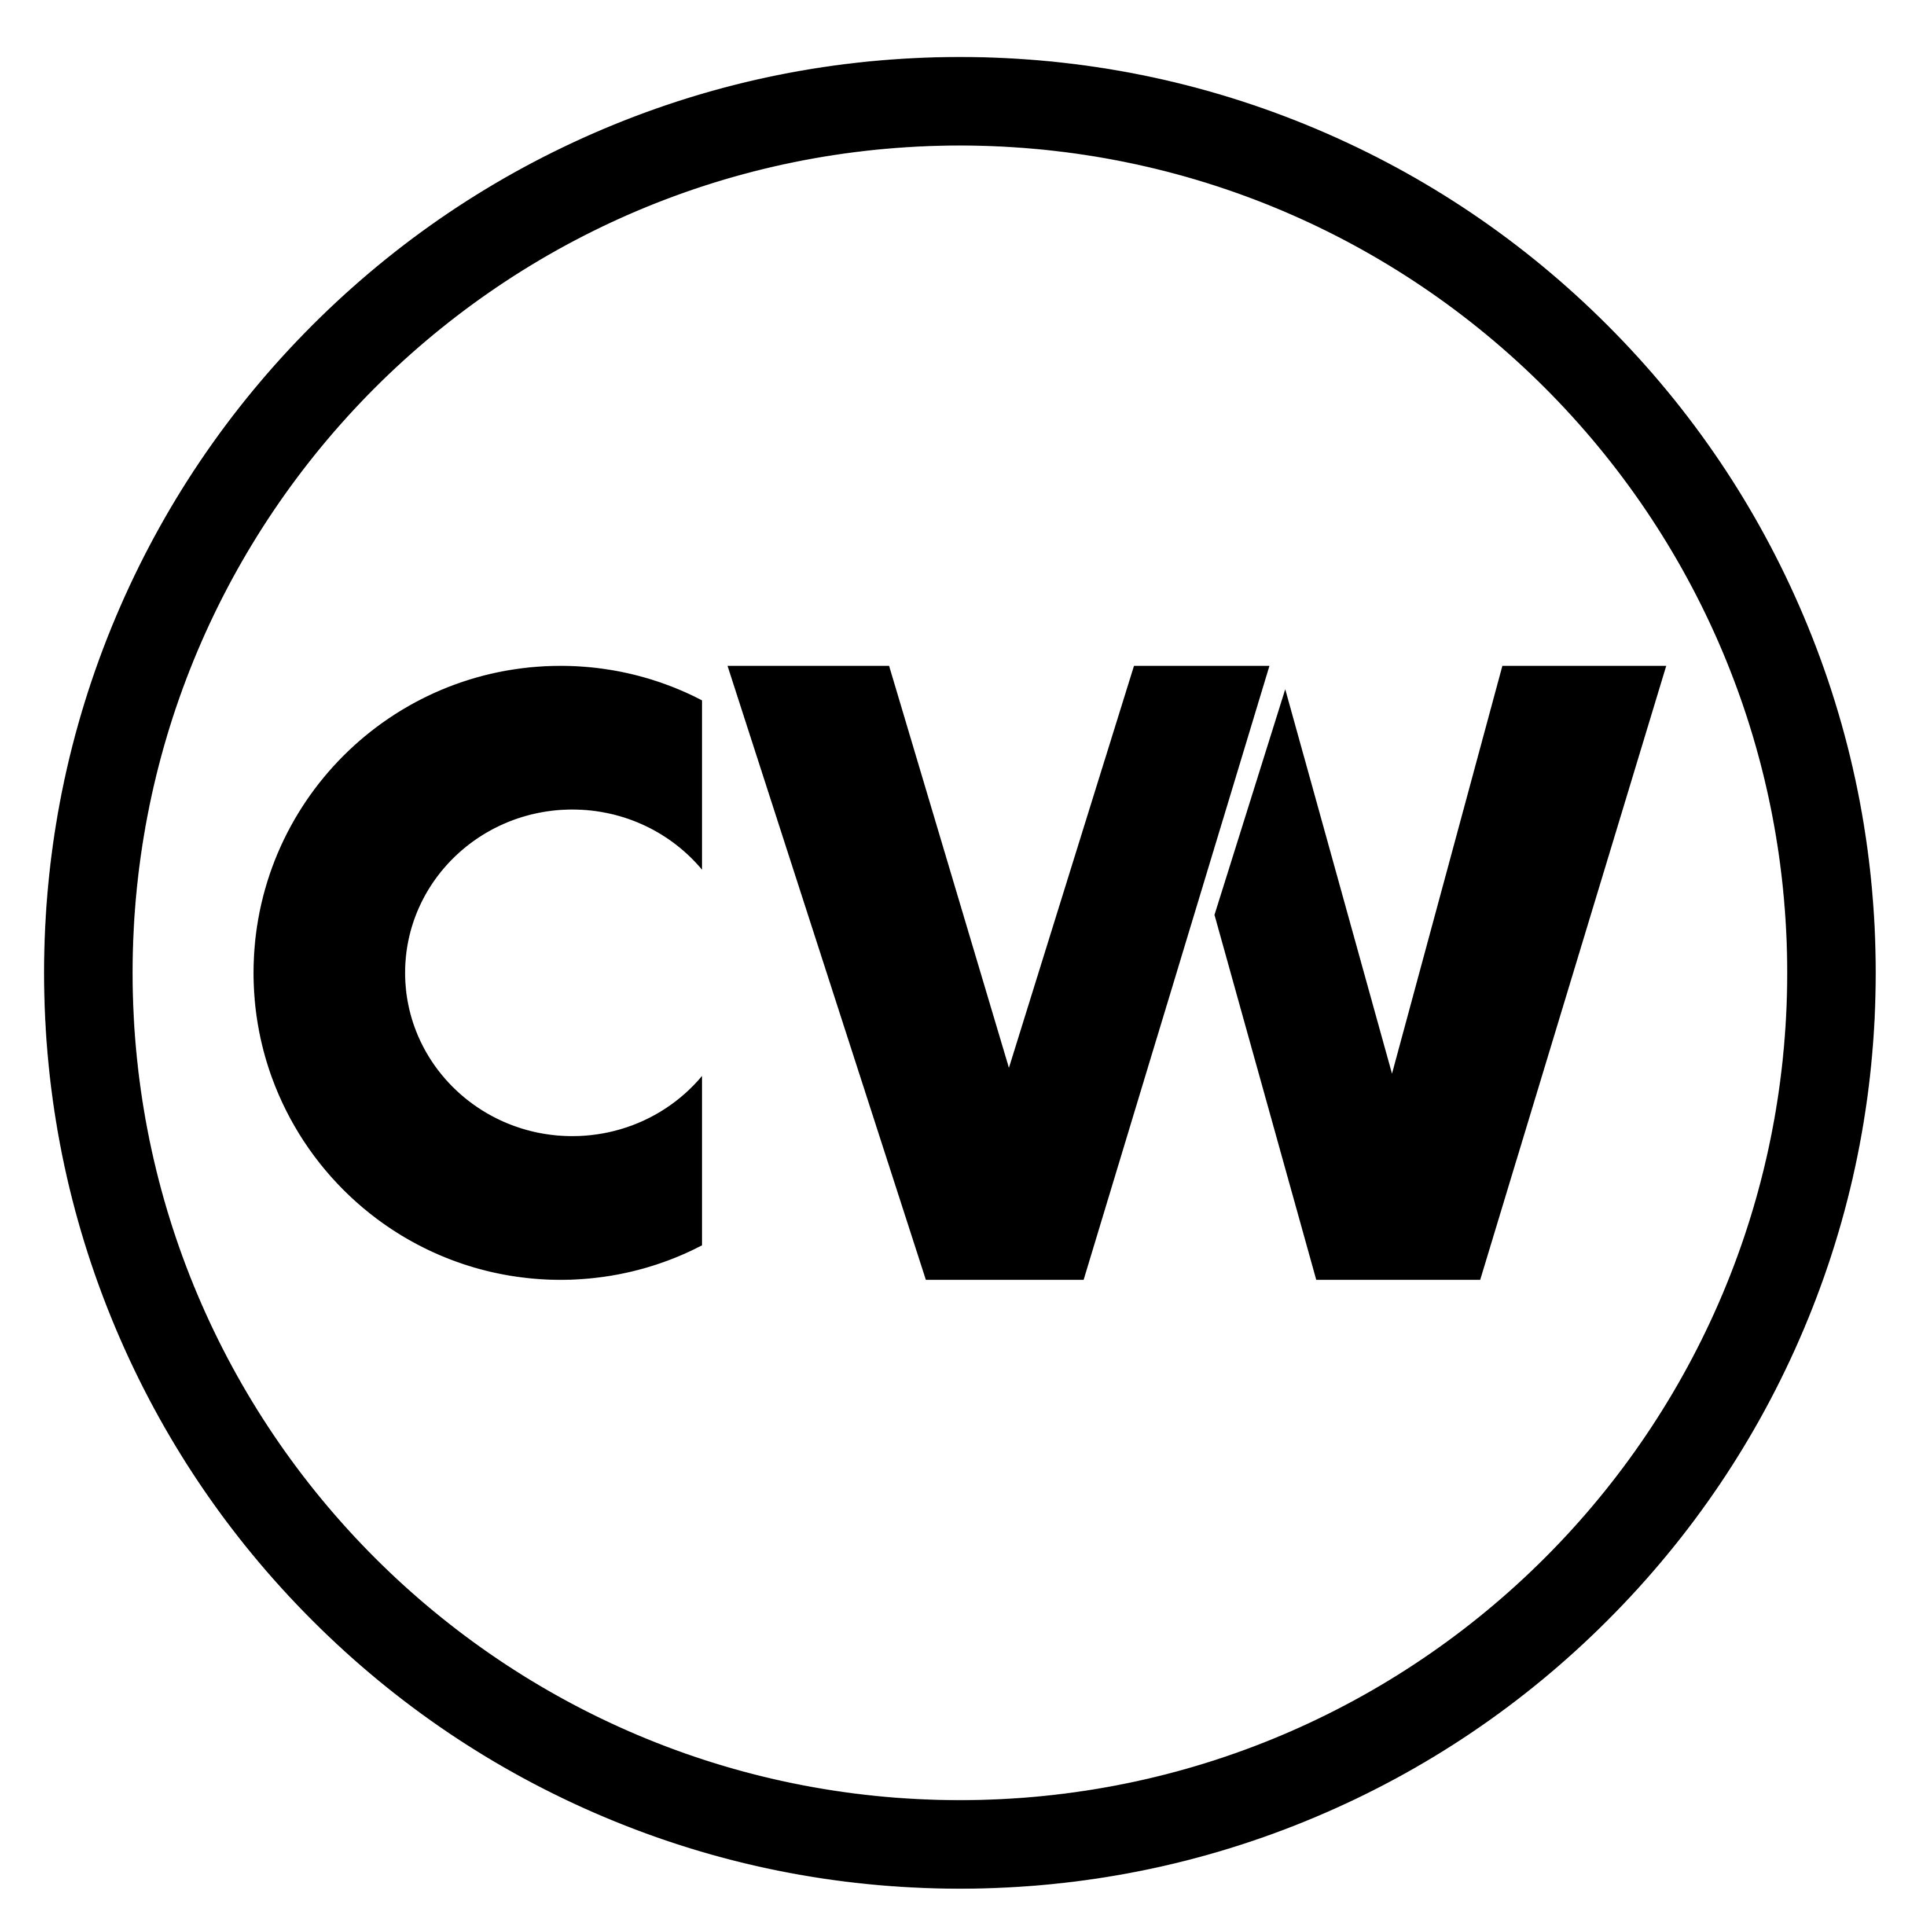 Catwalk Salon and Spa